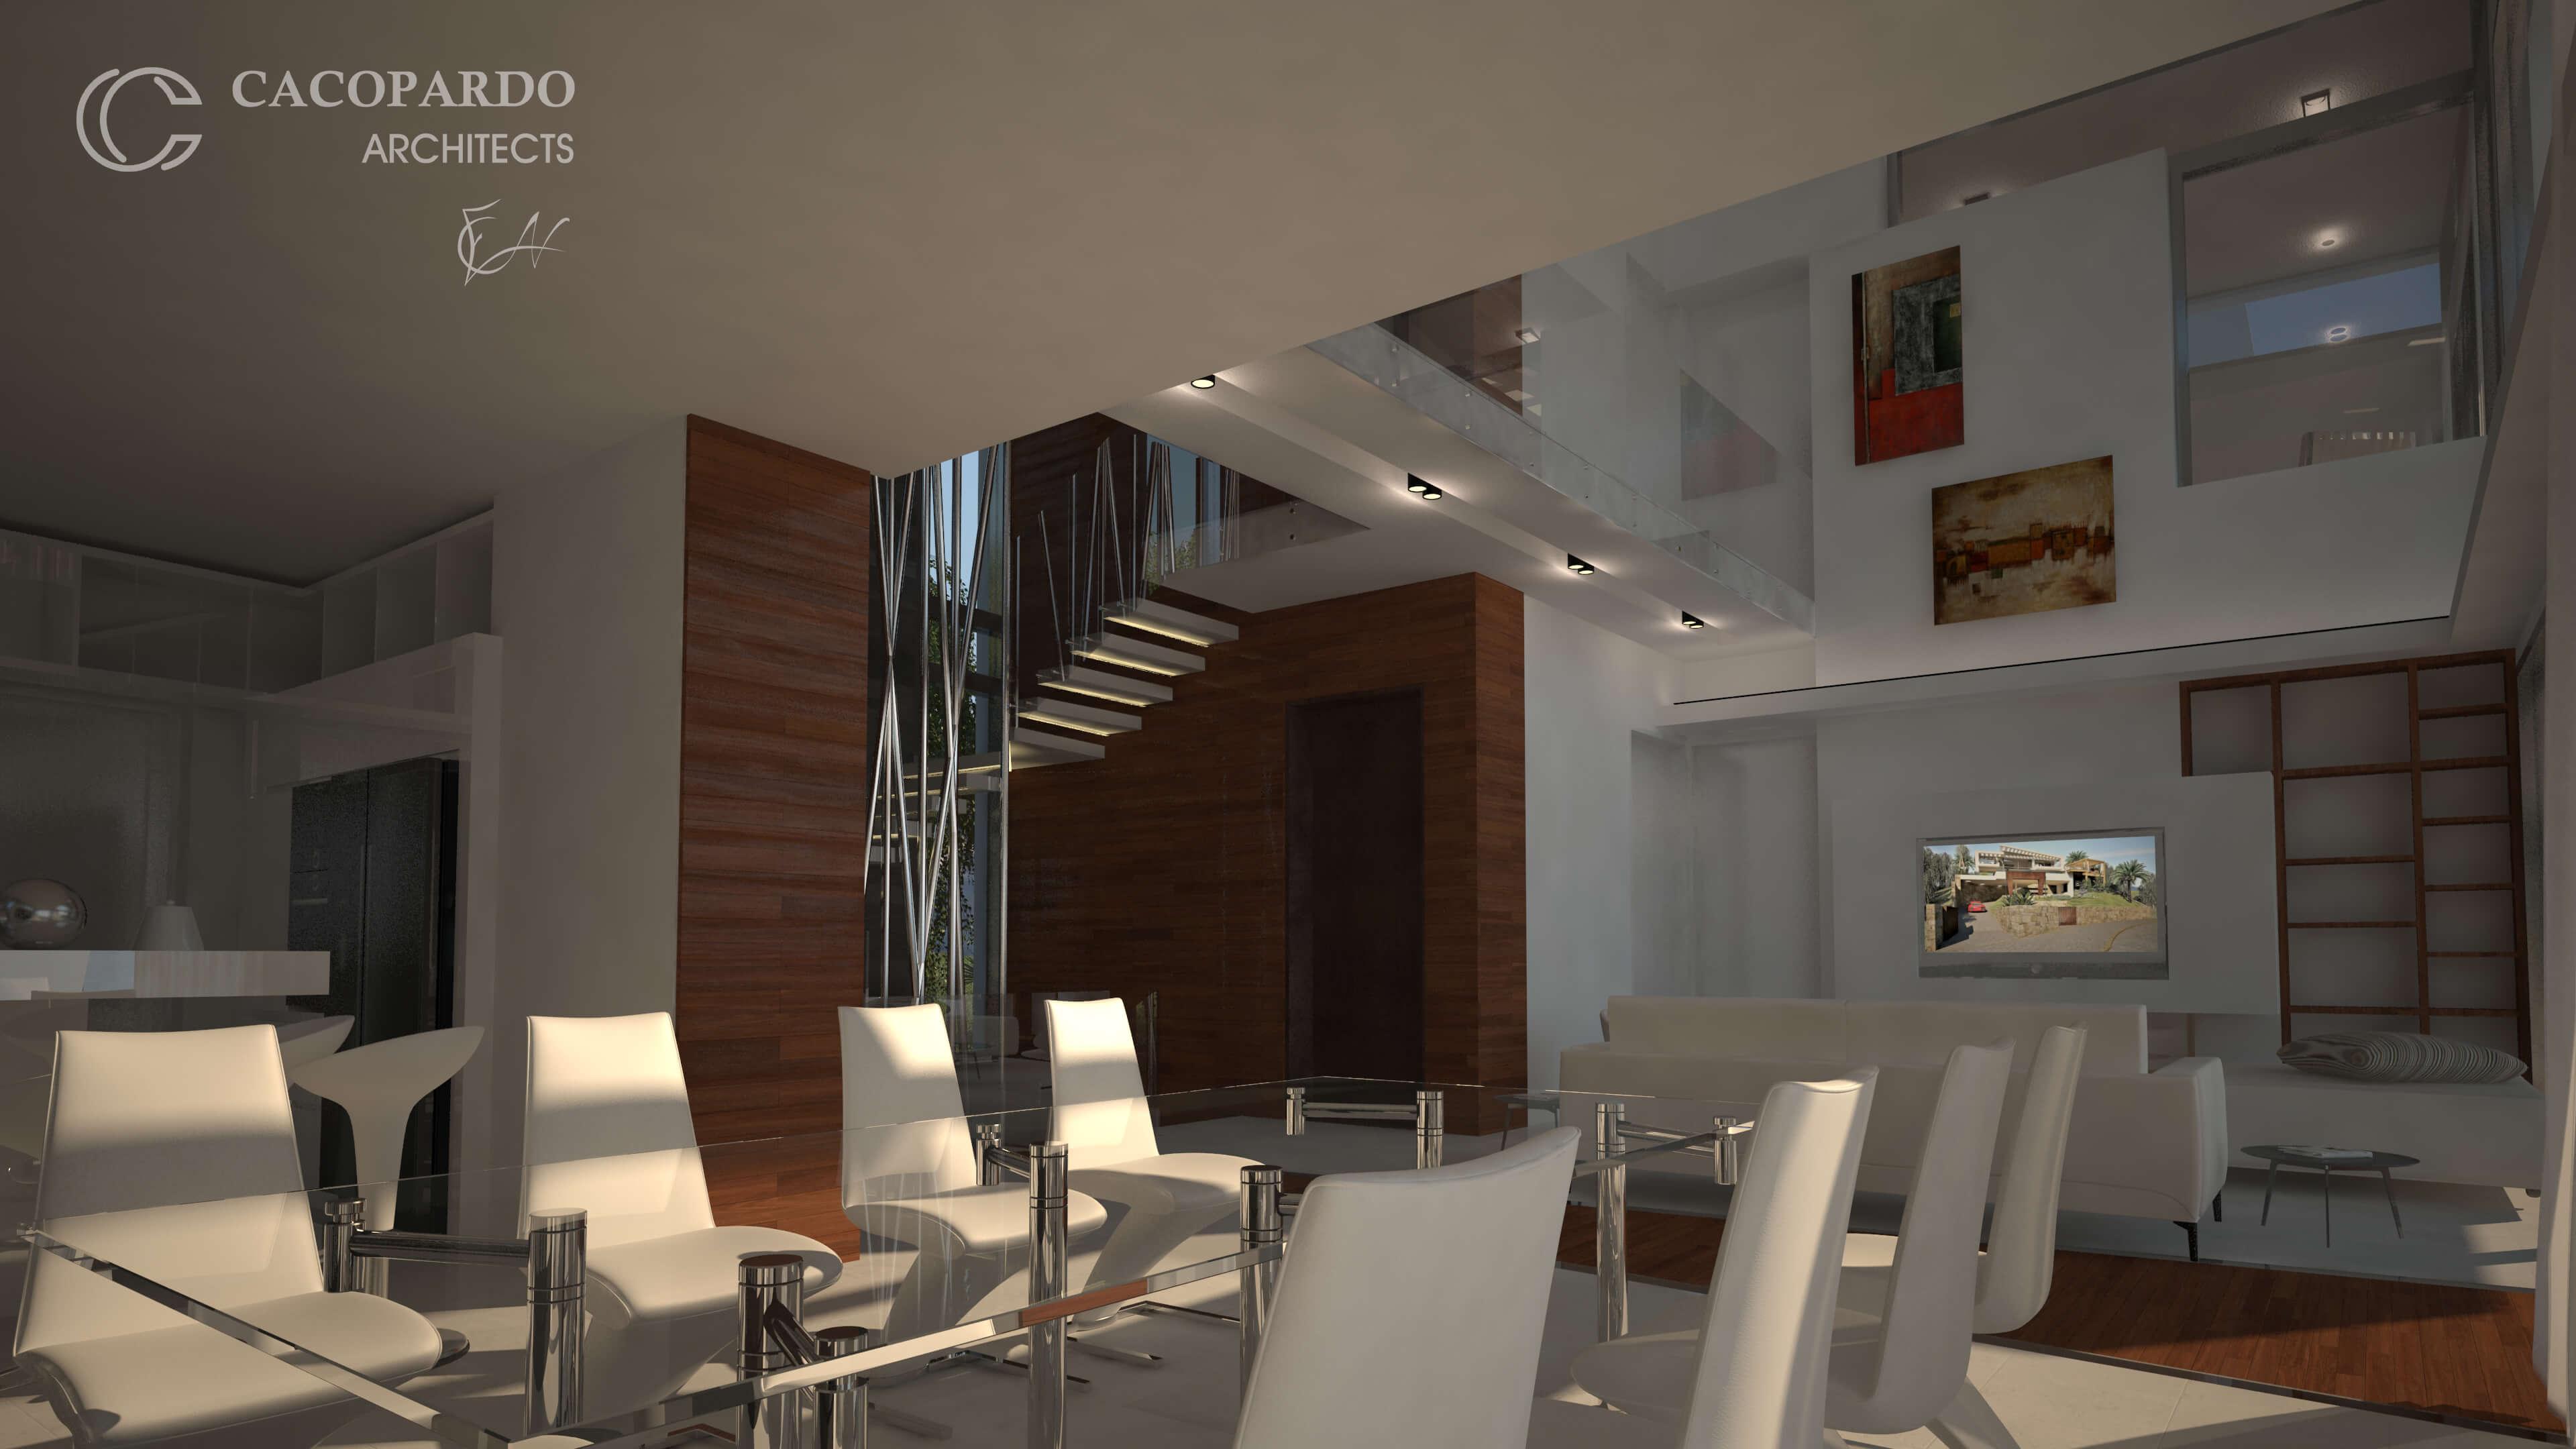 Vista del comedor y la escalera-Infinitum House- Costa del Sol